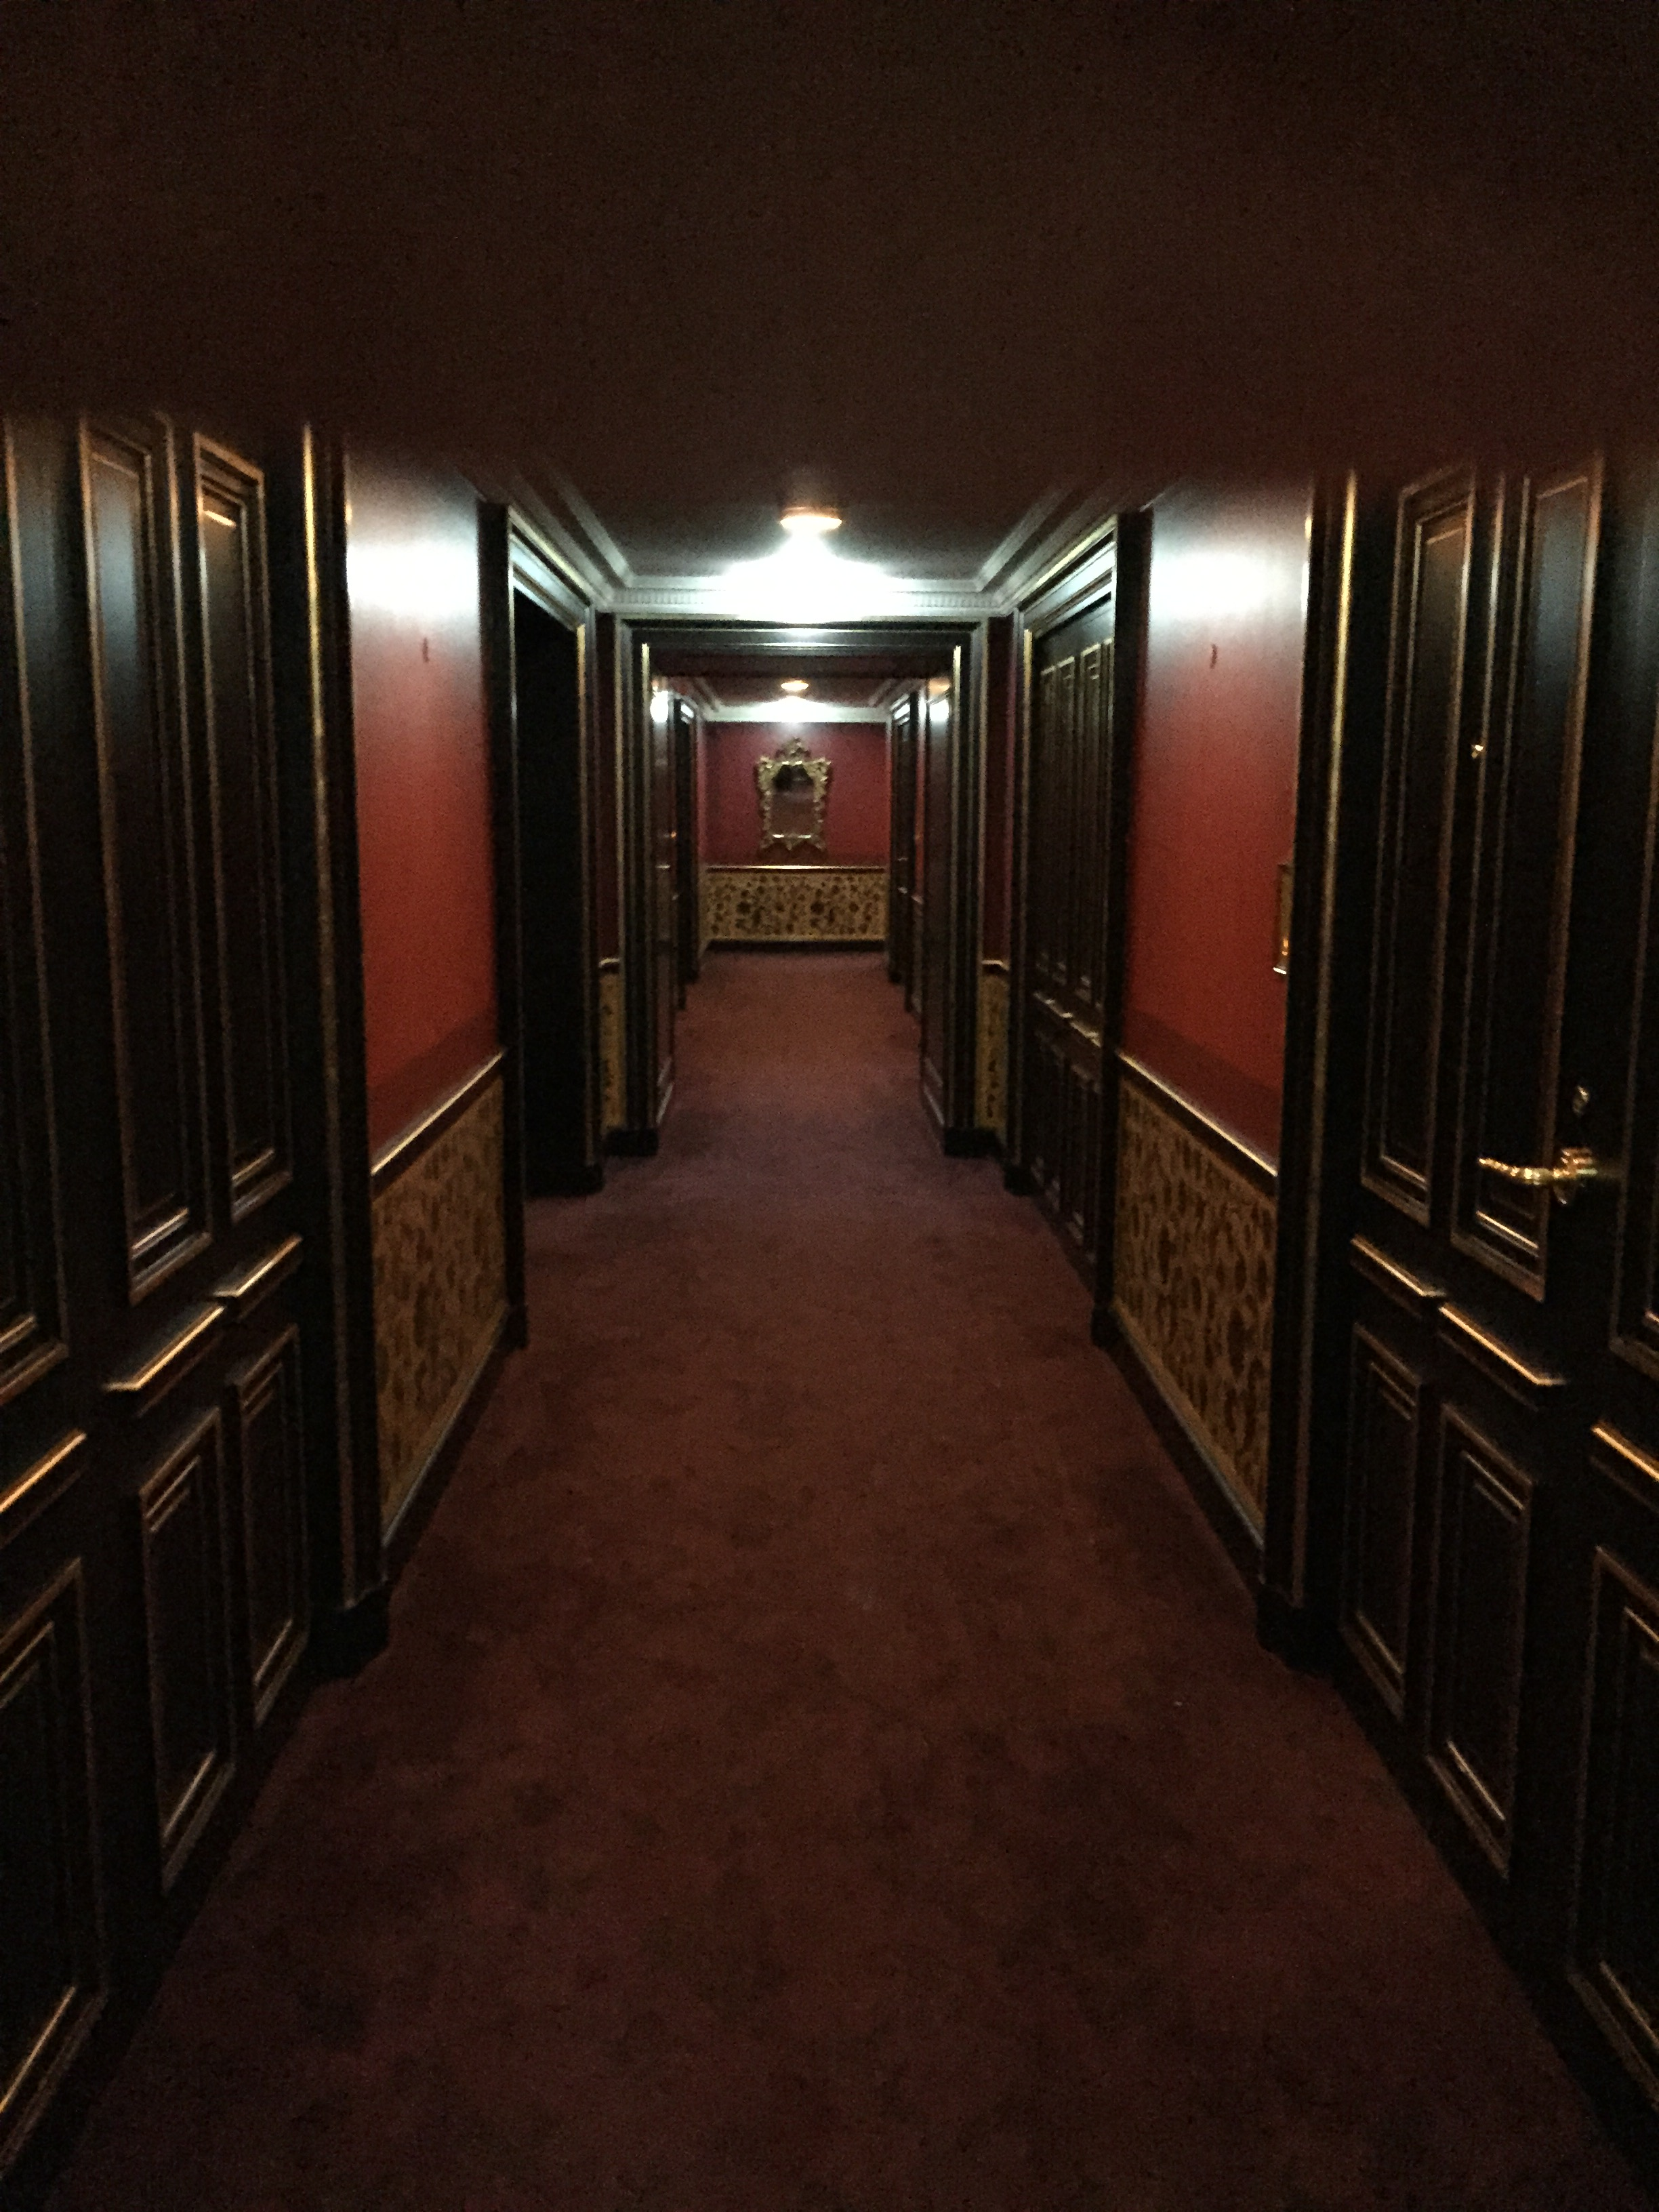 la_reserve_paris_hotel_rooms_fancyoli